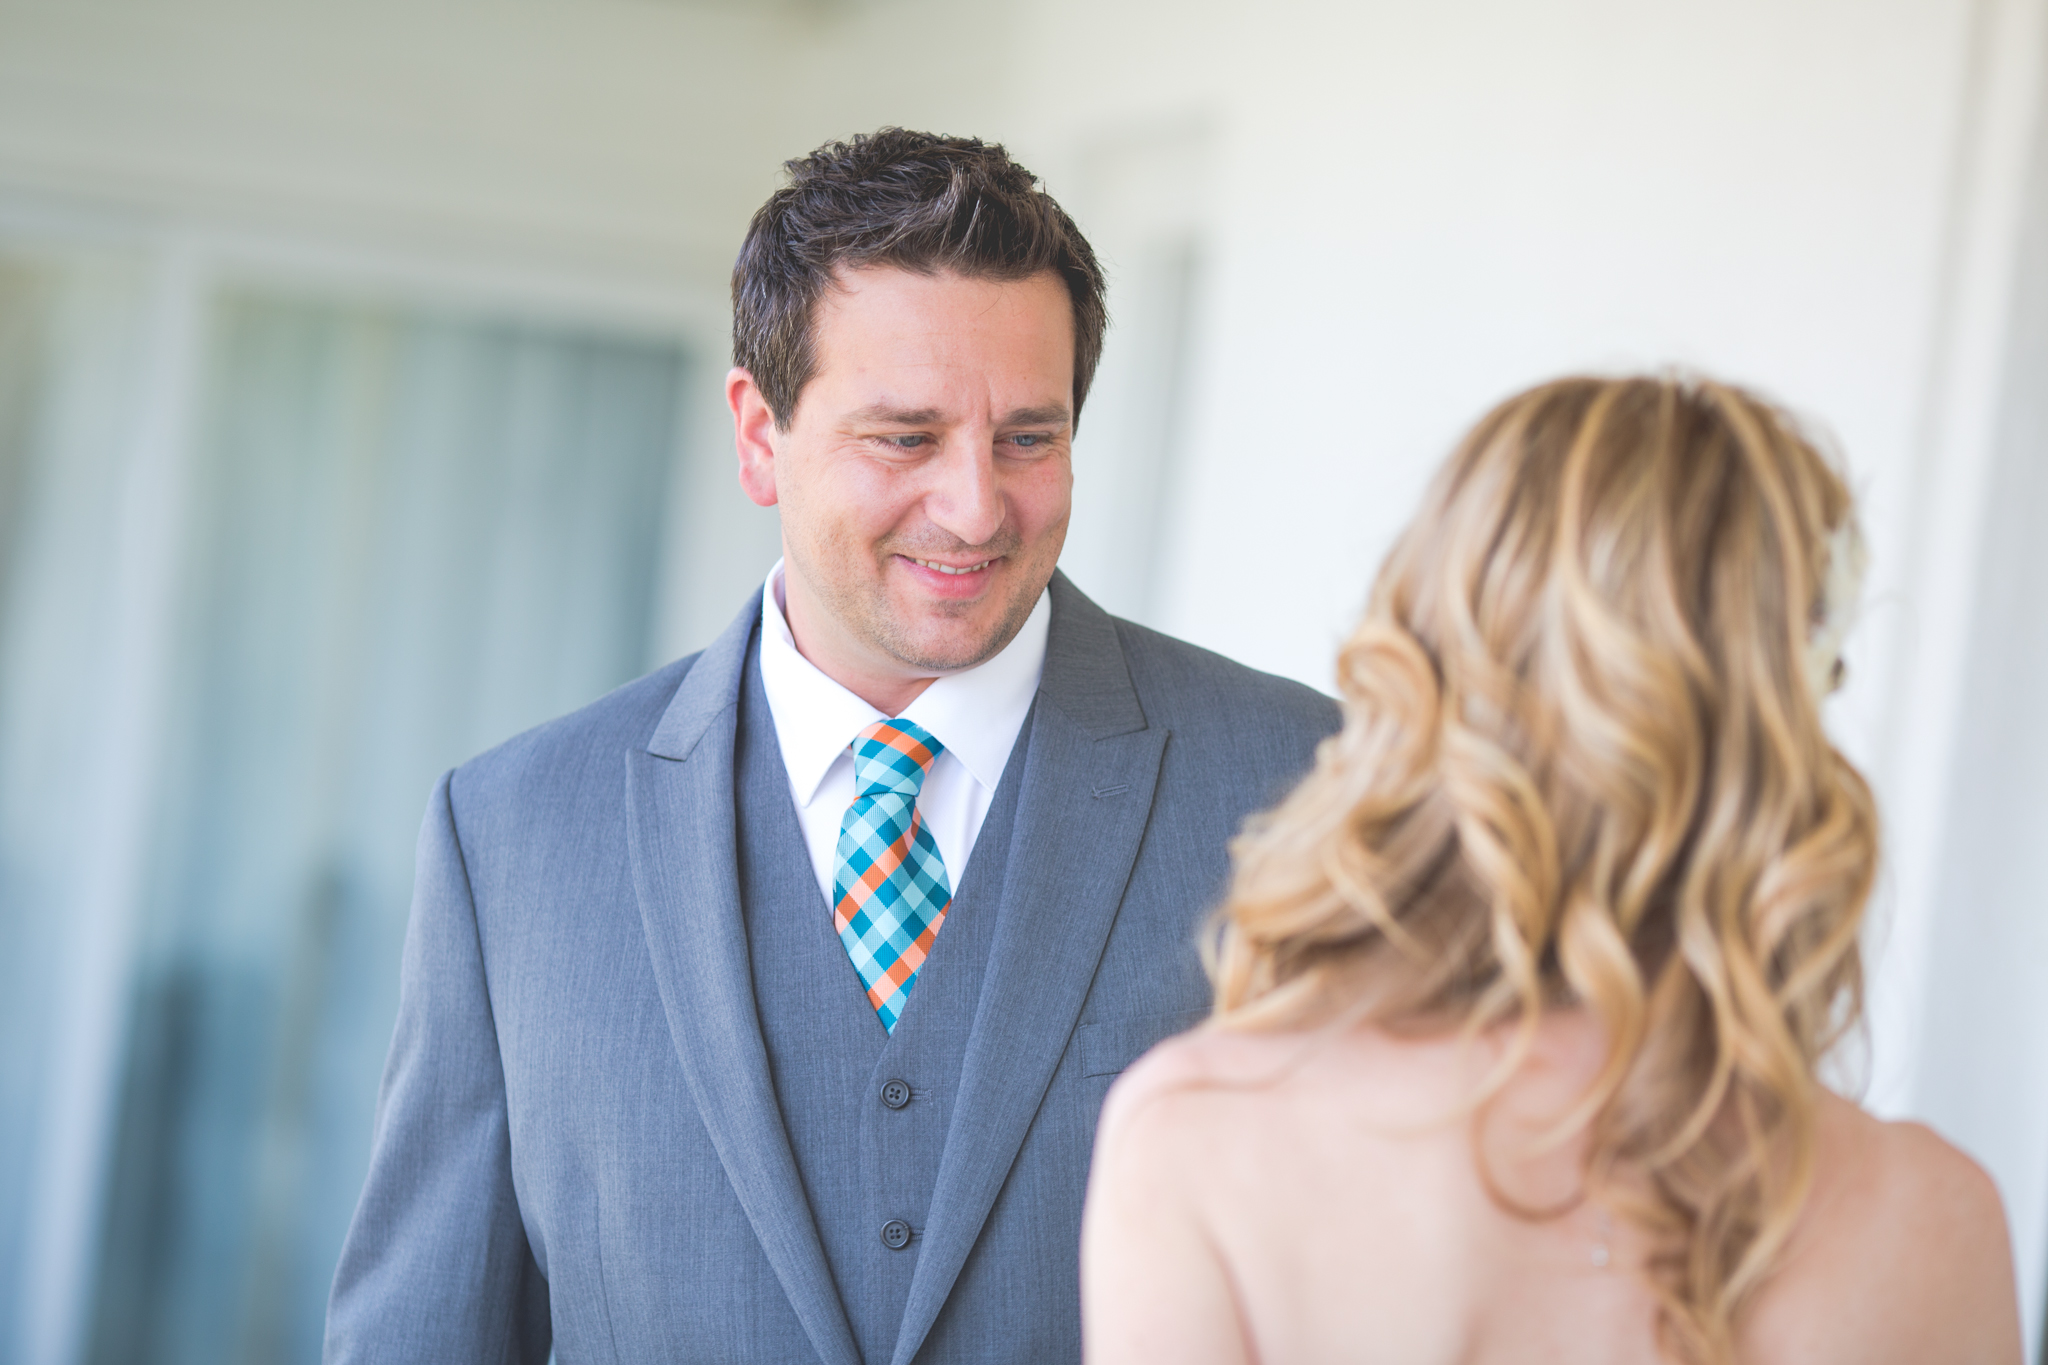 scottsdale-wedding-photographer-el-dorado-ben-turn-first-look